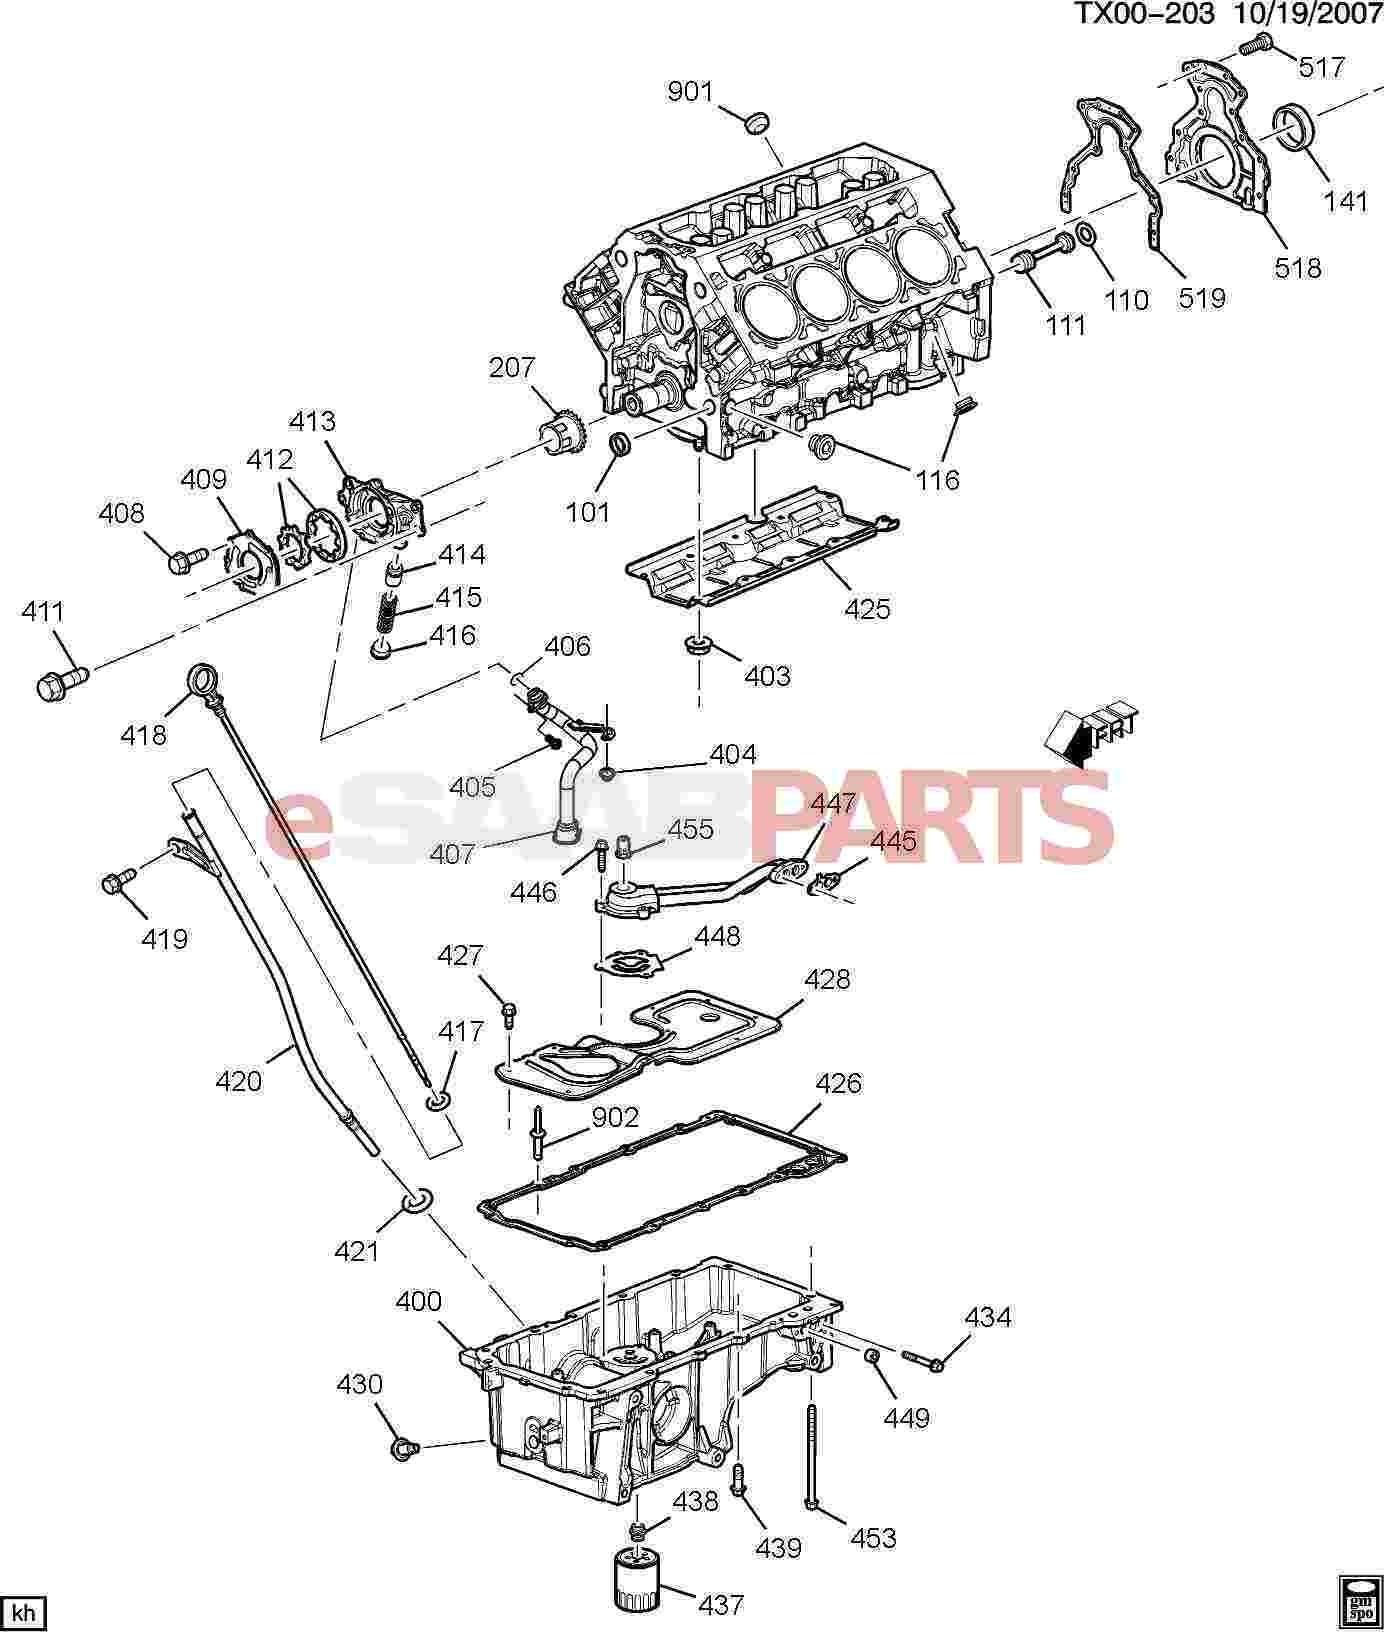 V8 Engine Parts Diagram ] Saab Plug M16x1 5×14 24 Od society Automotive Of V8 Engine Parts Diagram